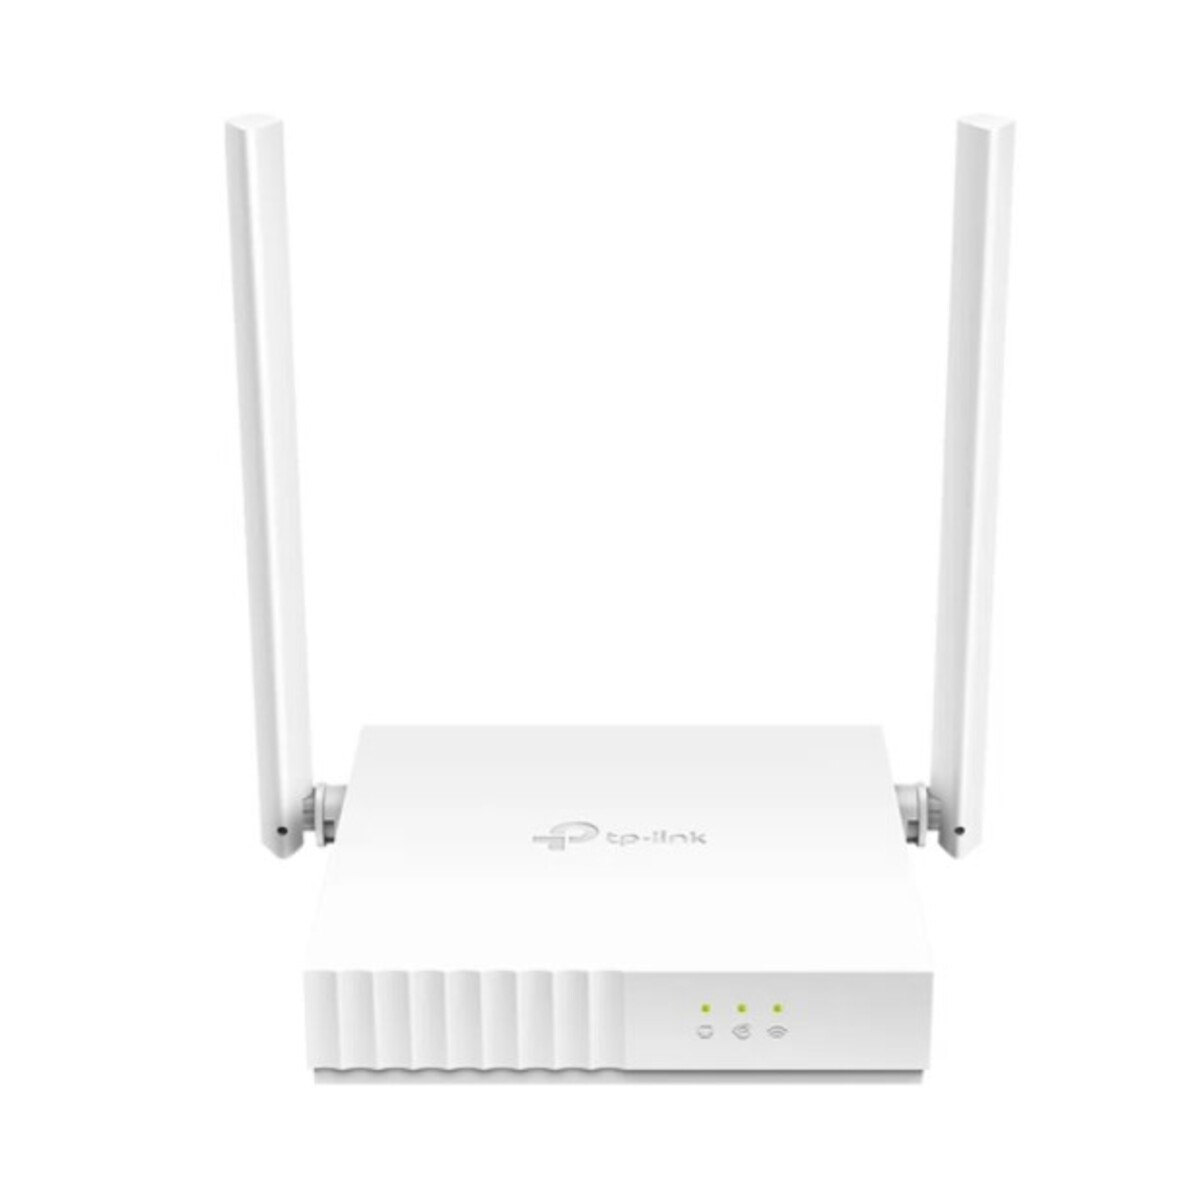 Roteador Wireless Wi-Fi 300Mbps com 2 Antenas de 5dBi TL-WR829N Tp-Link